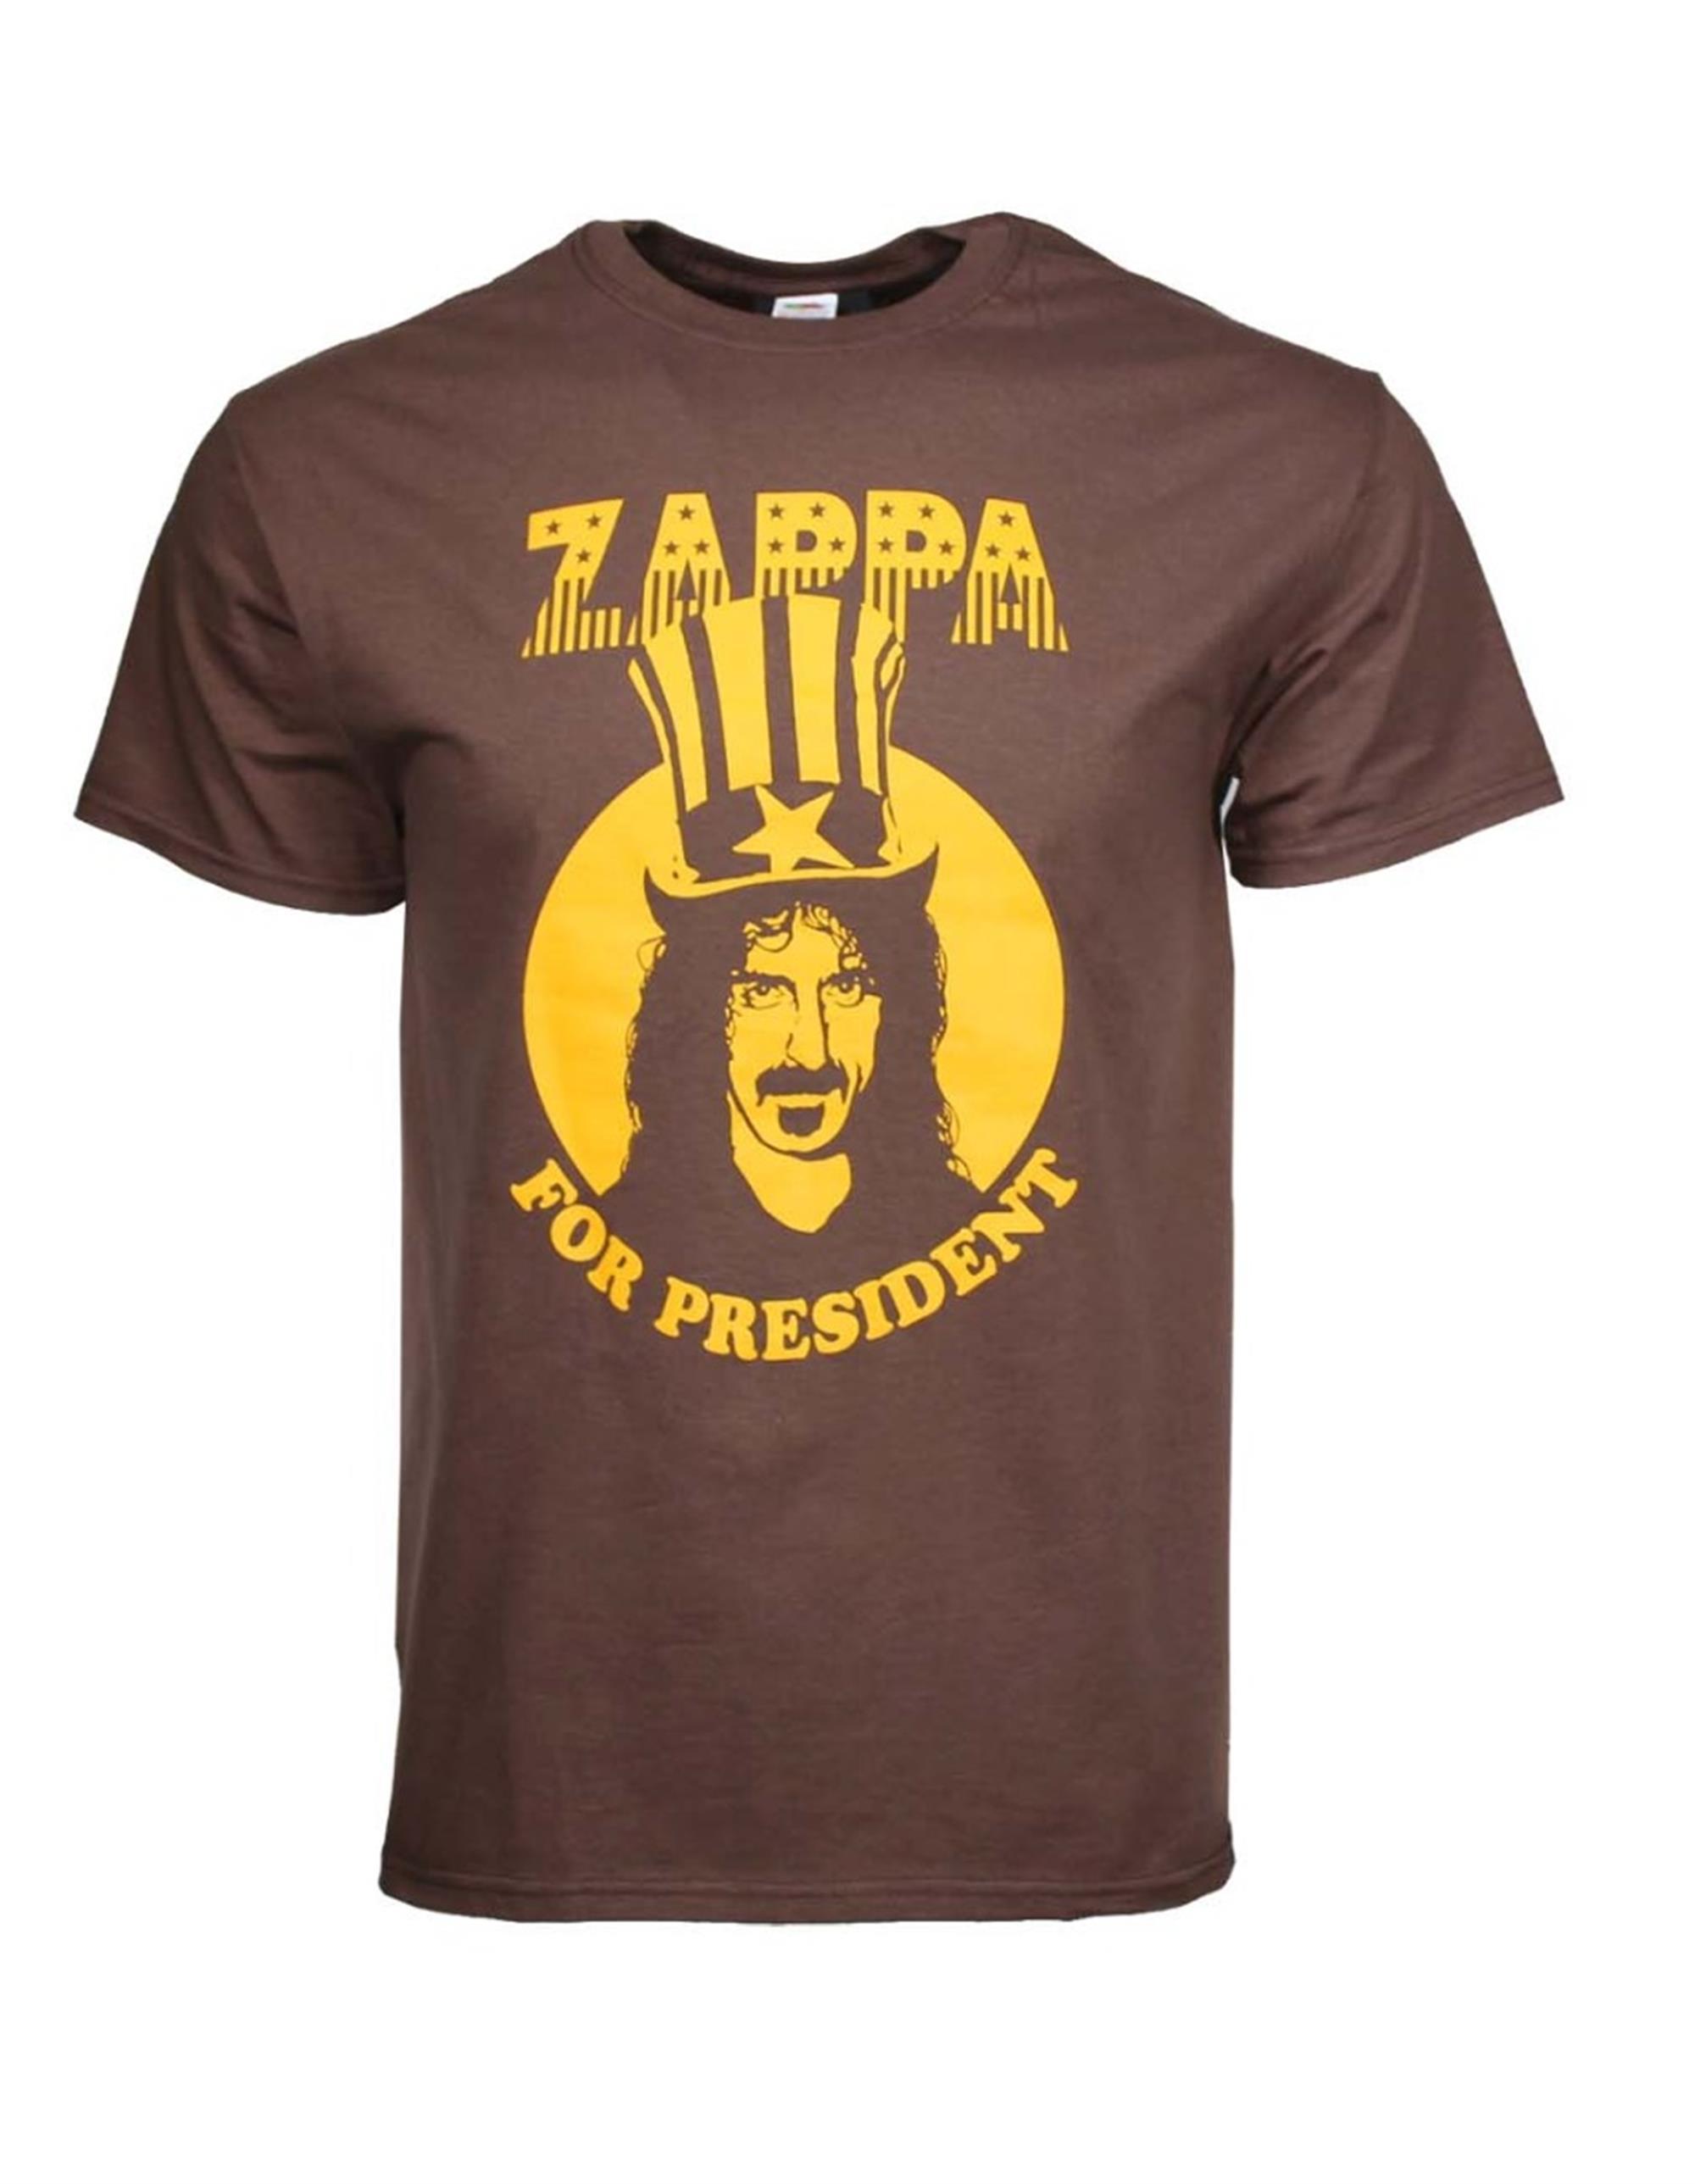 Frank Zappa For President T-Shirt